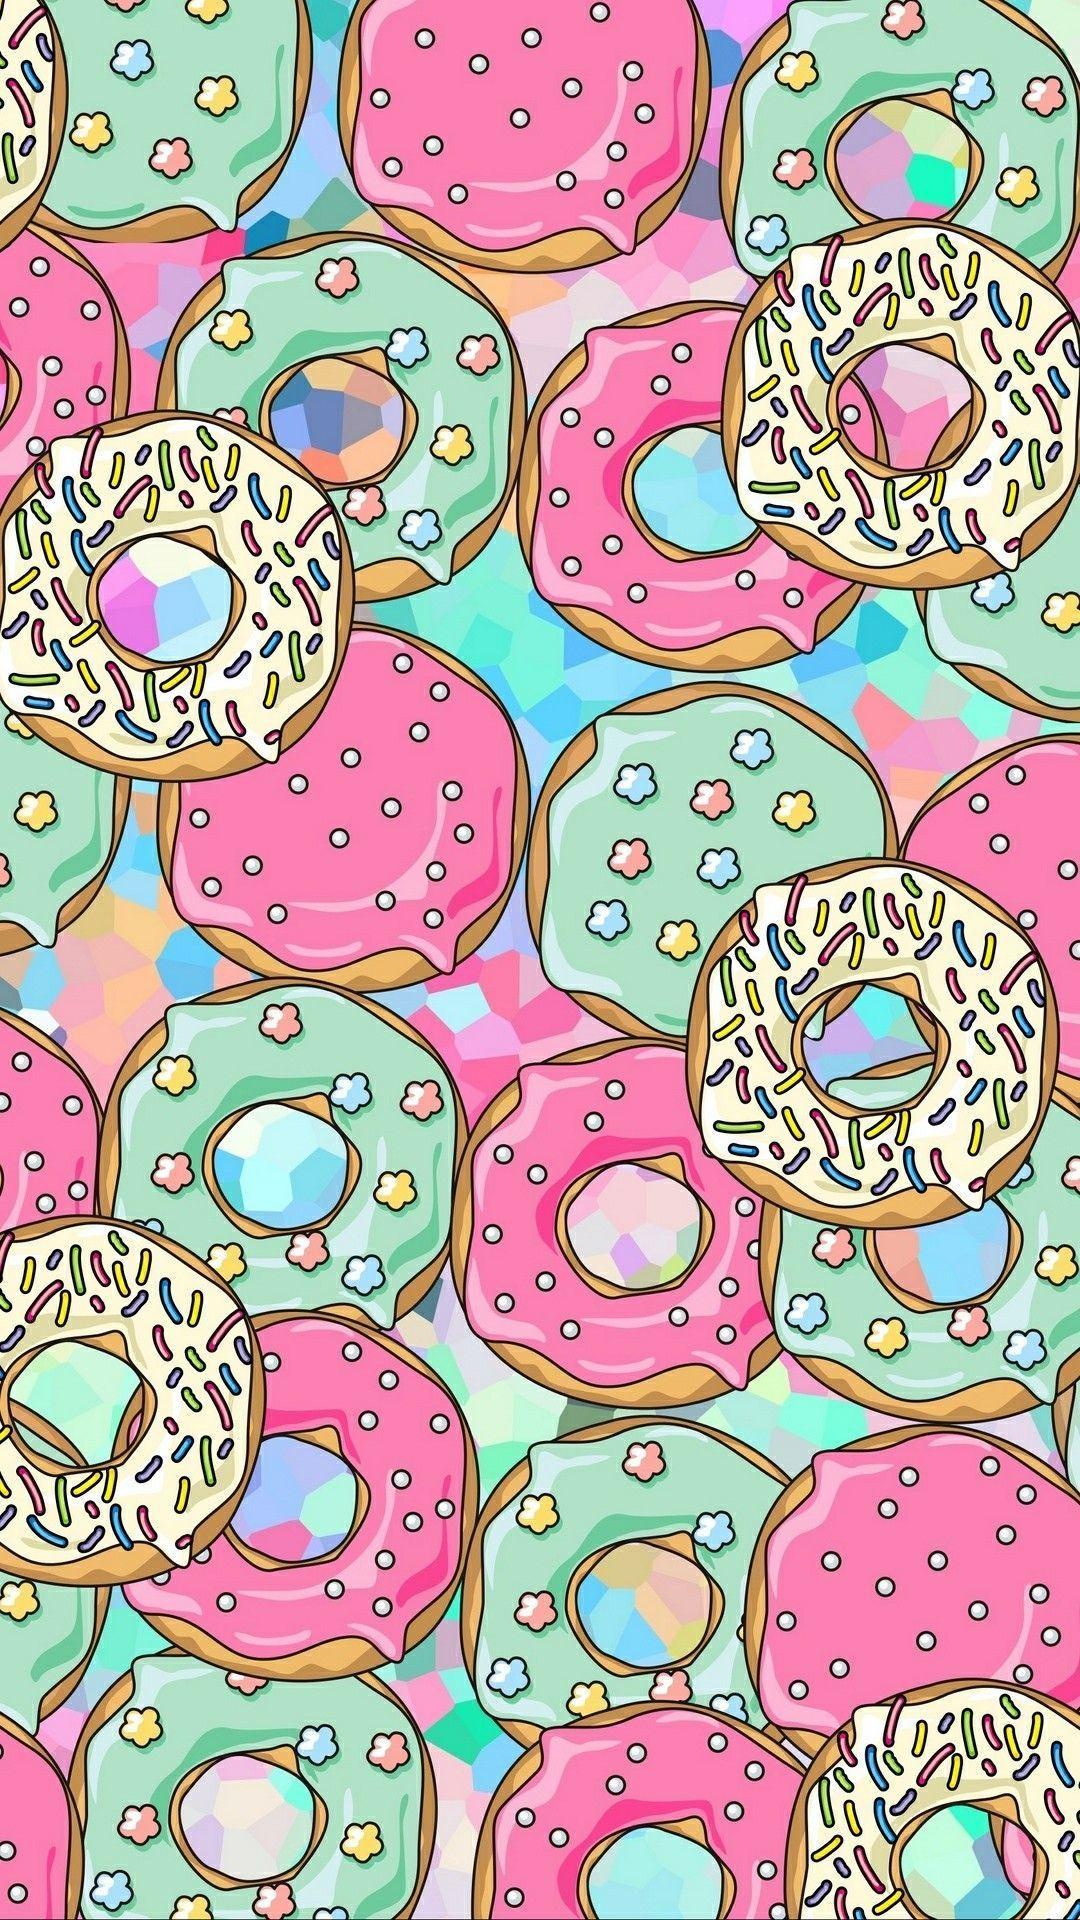 Donuts wallpaper in 2020 Wallpaper, Infinity wallpaper